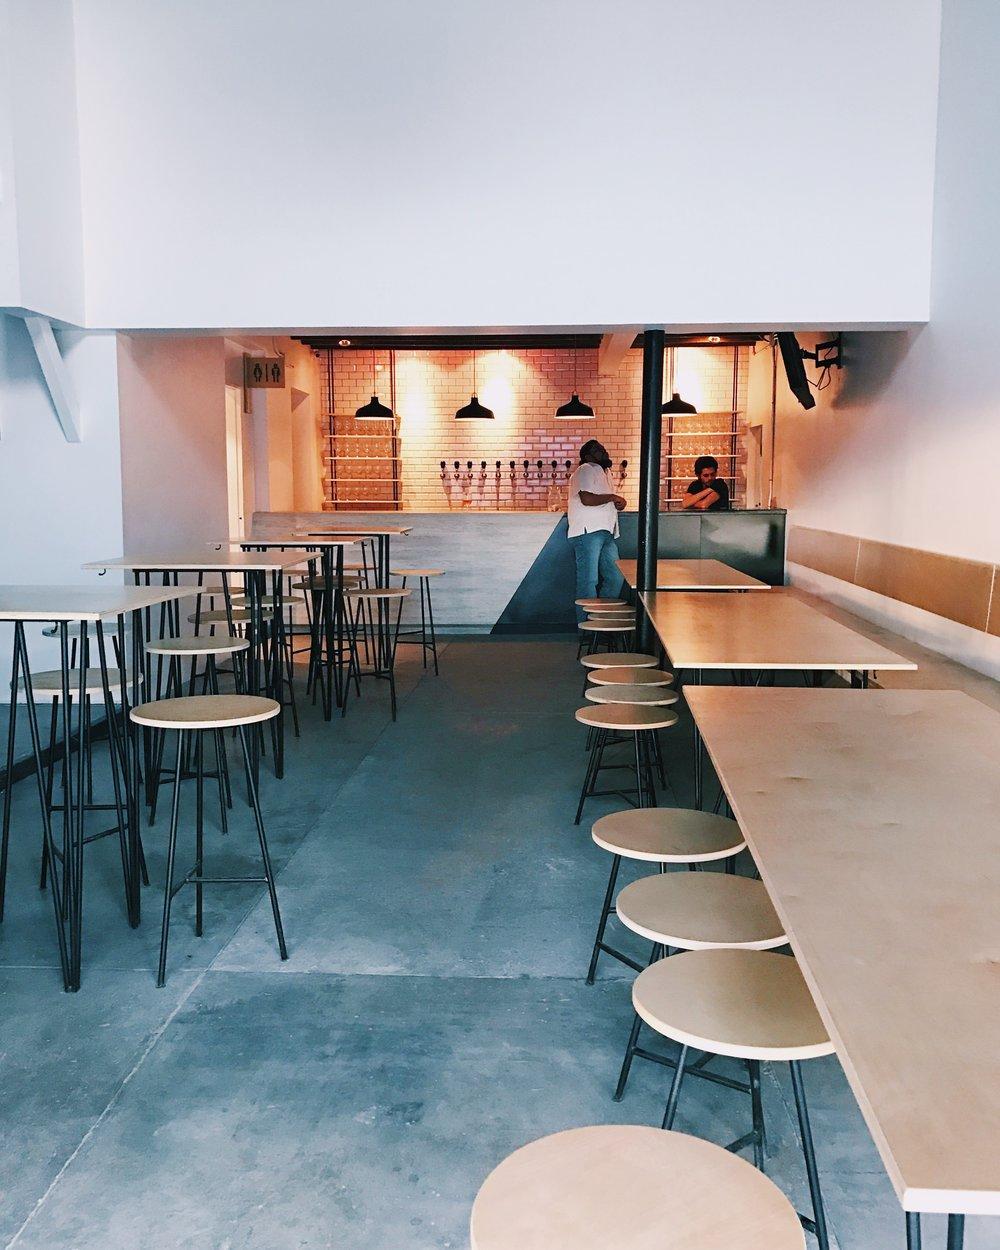 Teorema / Lúdica Co-Tasting Room, Tijuana